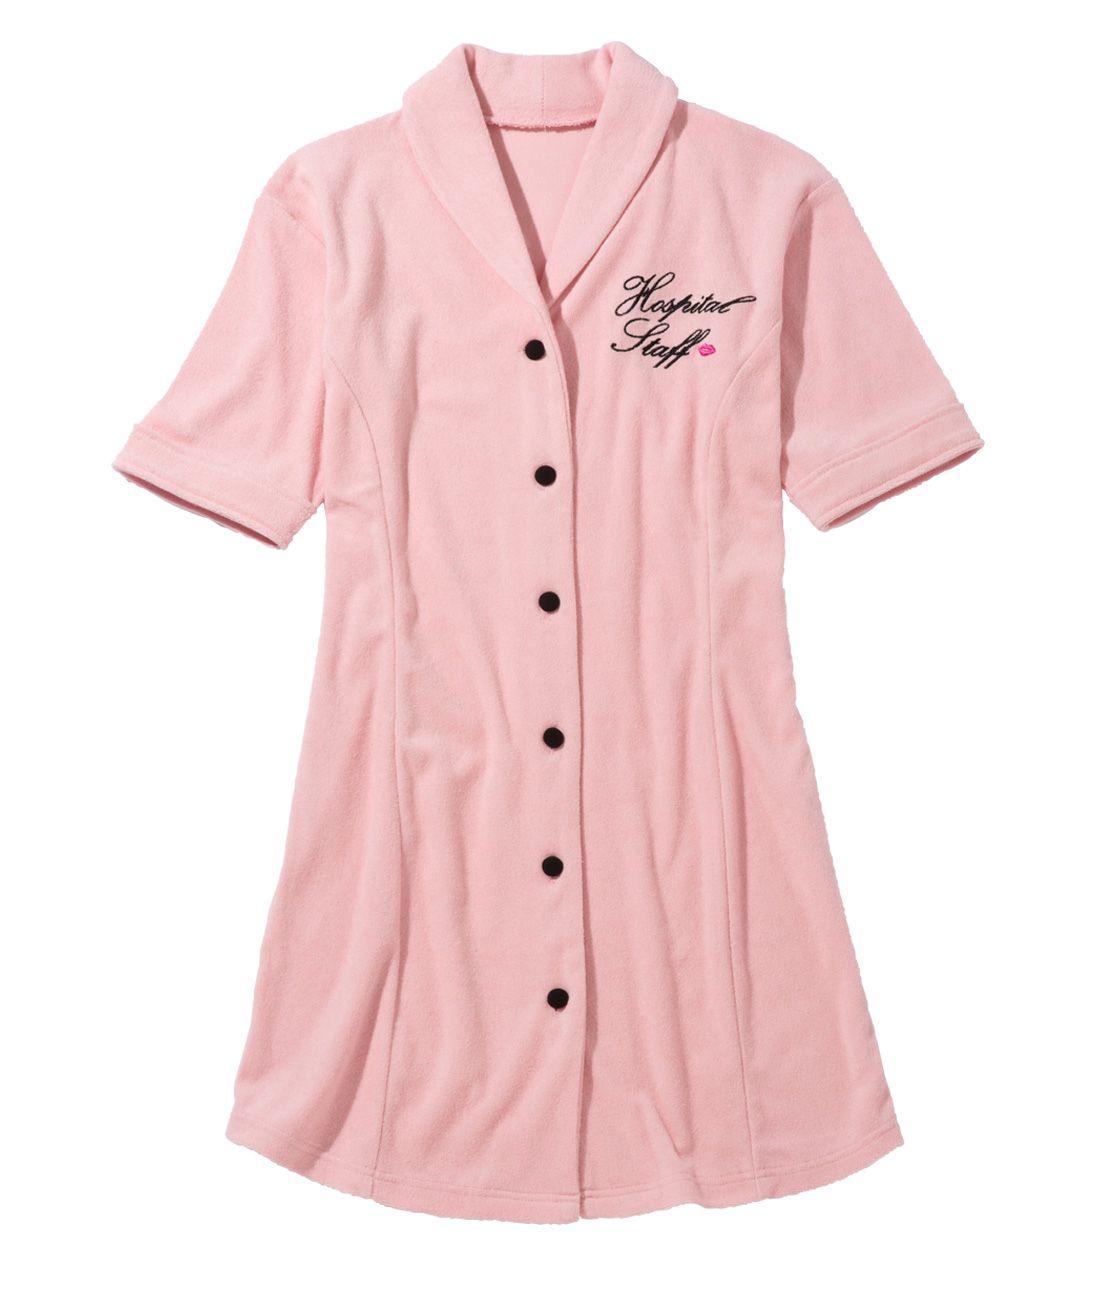 YM nurse dress